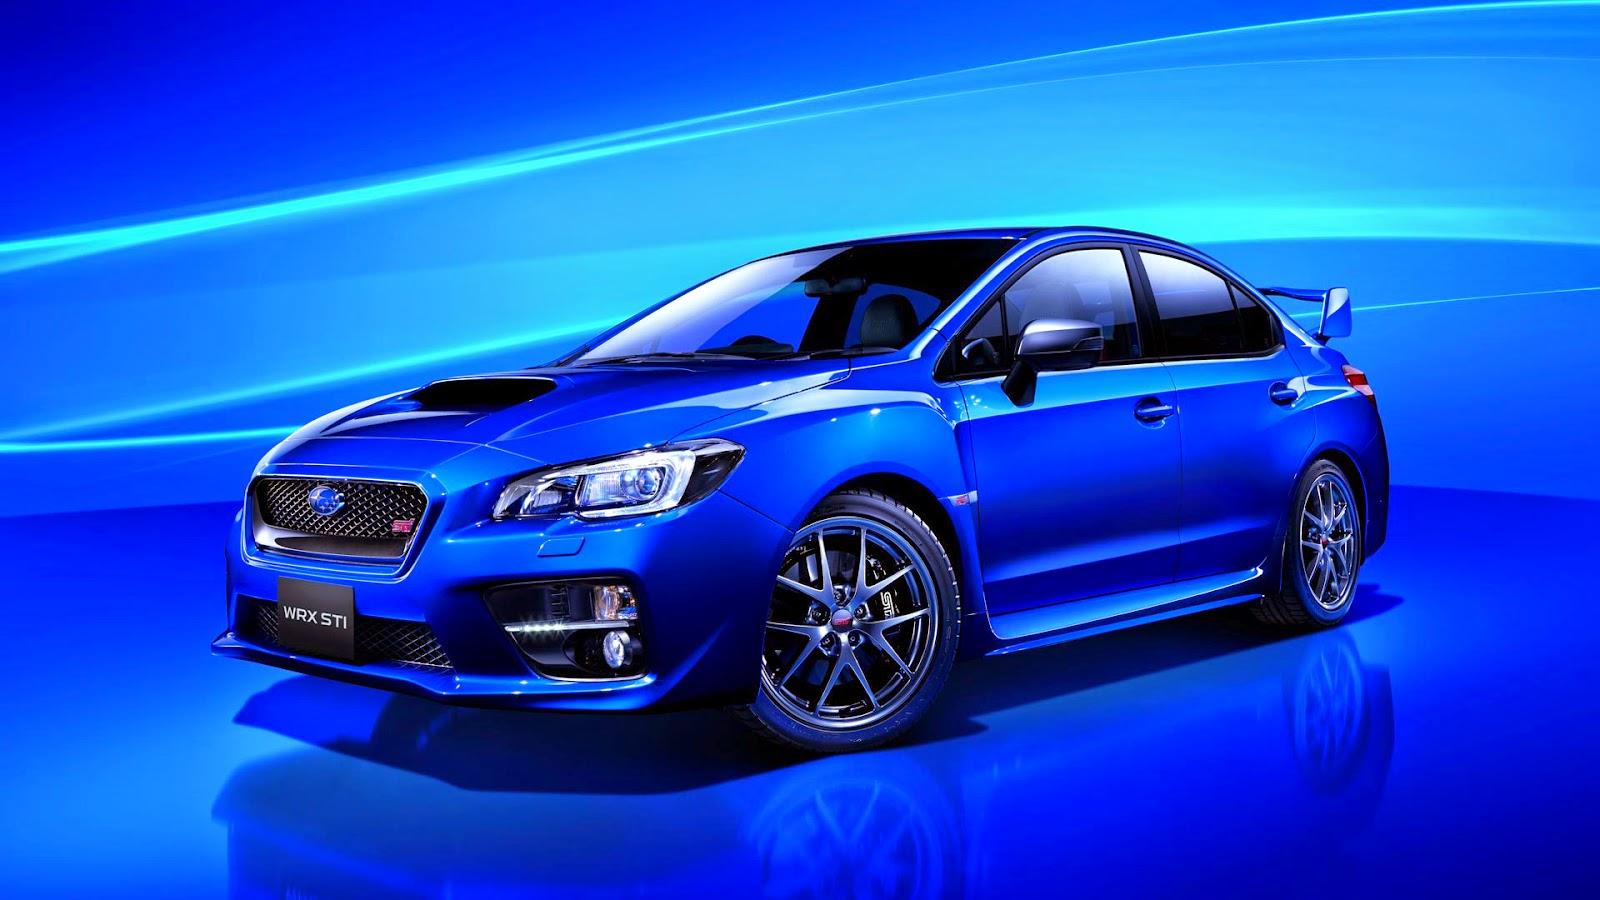 Wrx Cvt >> Leopaul's blog: Subaru WRX S4 (VAG) and WRX STi (VAB)